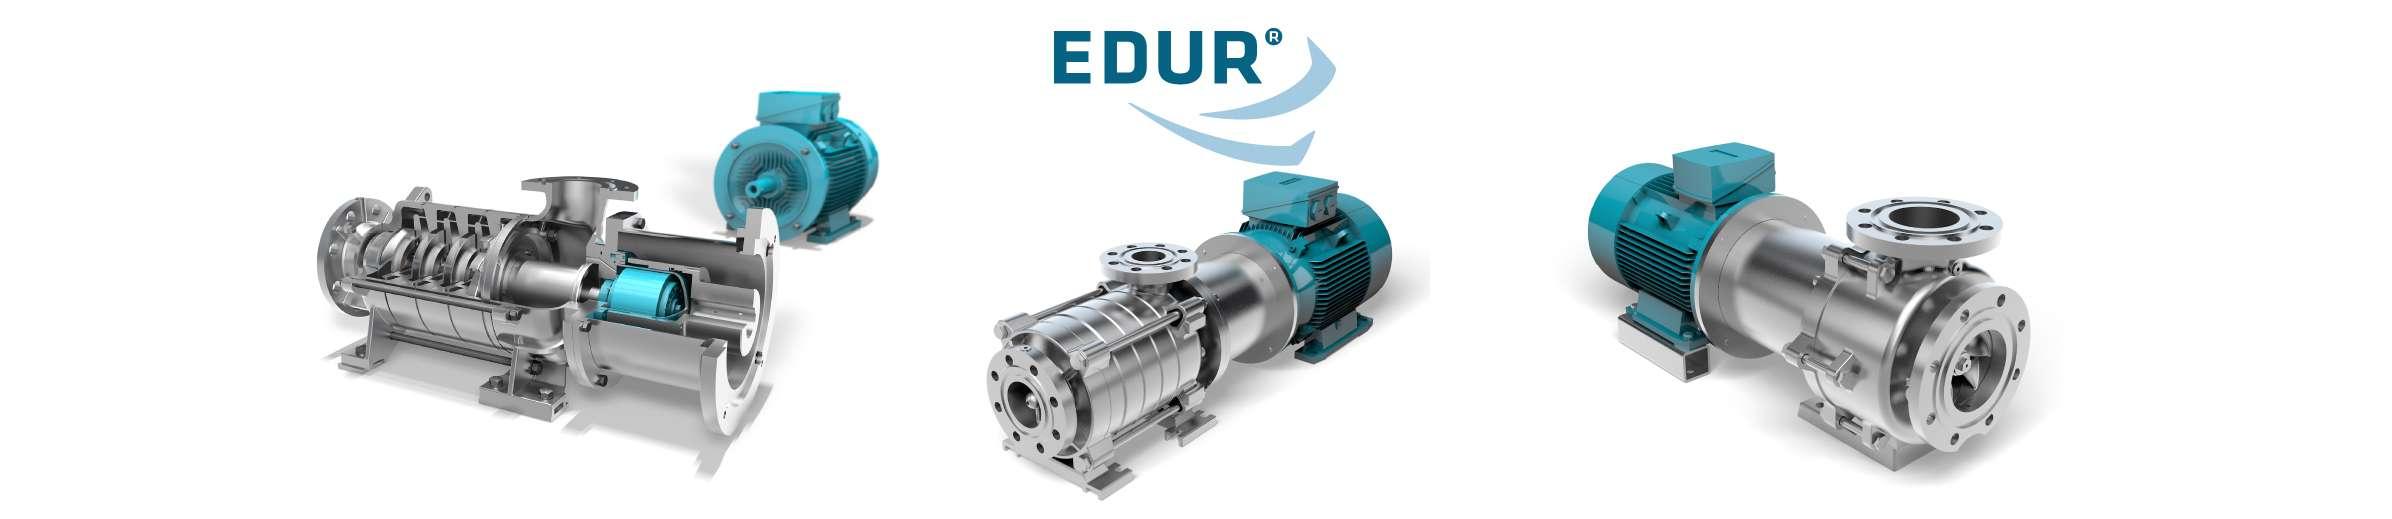 EDUR German made DAF pumps